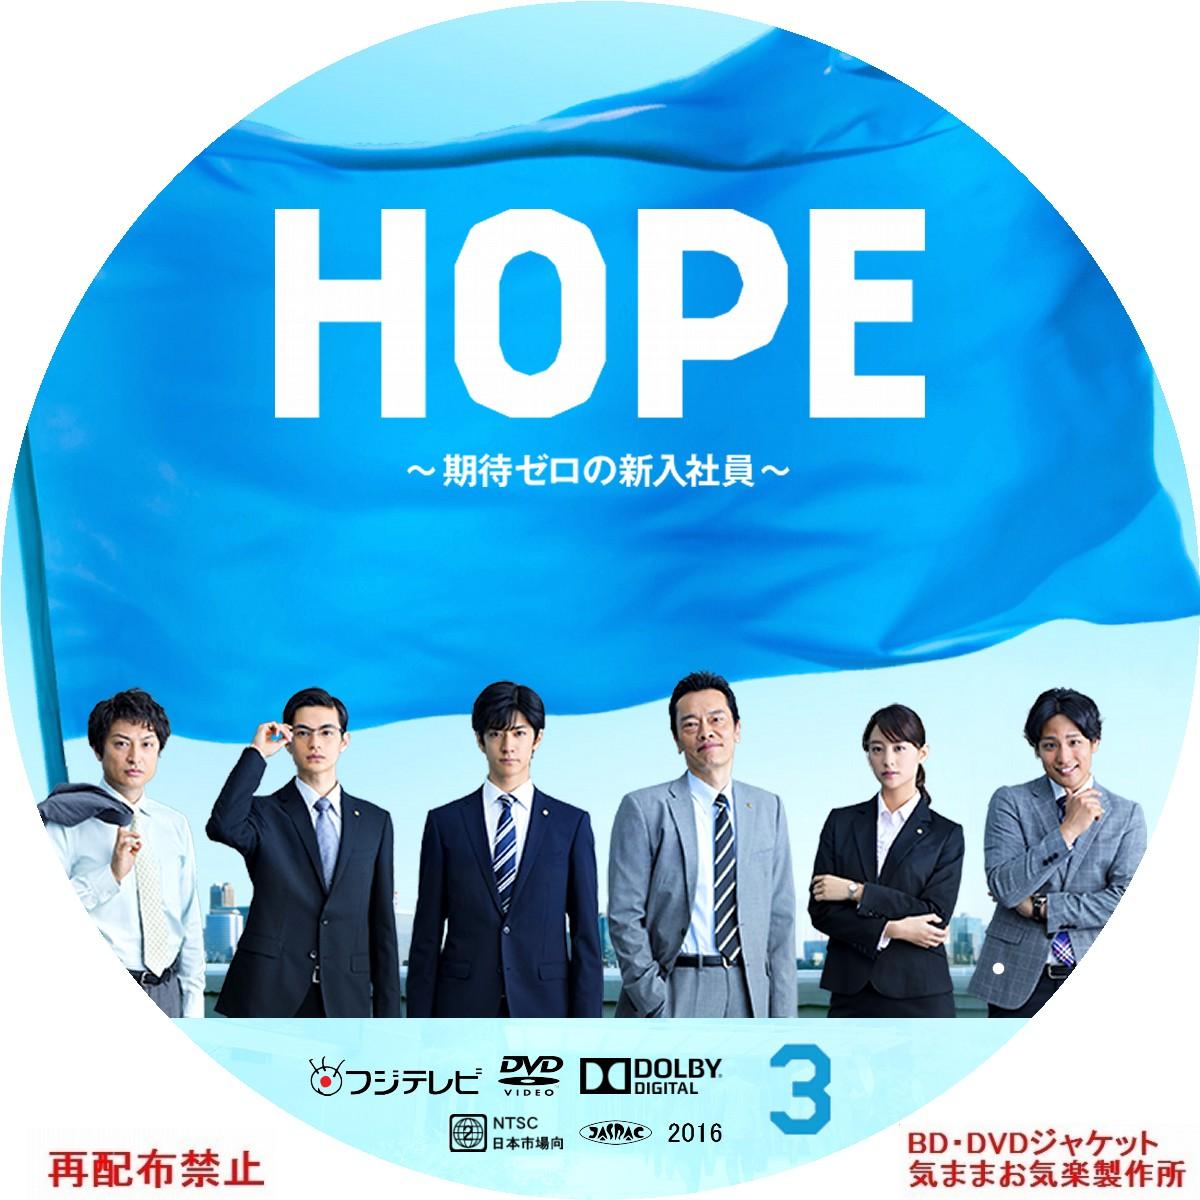 HOPE_03.jpg